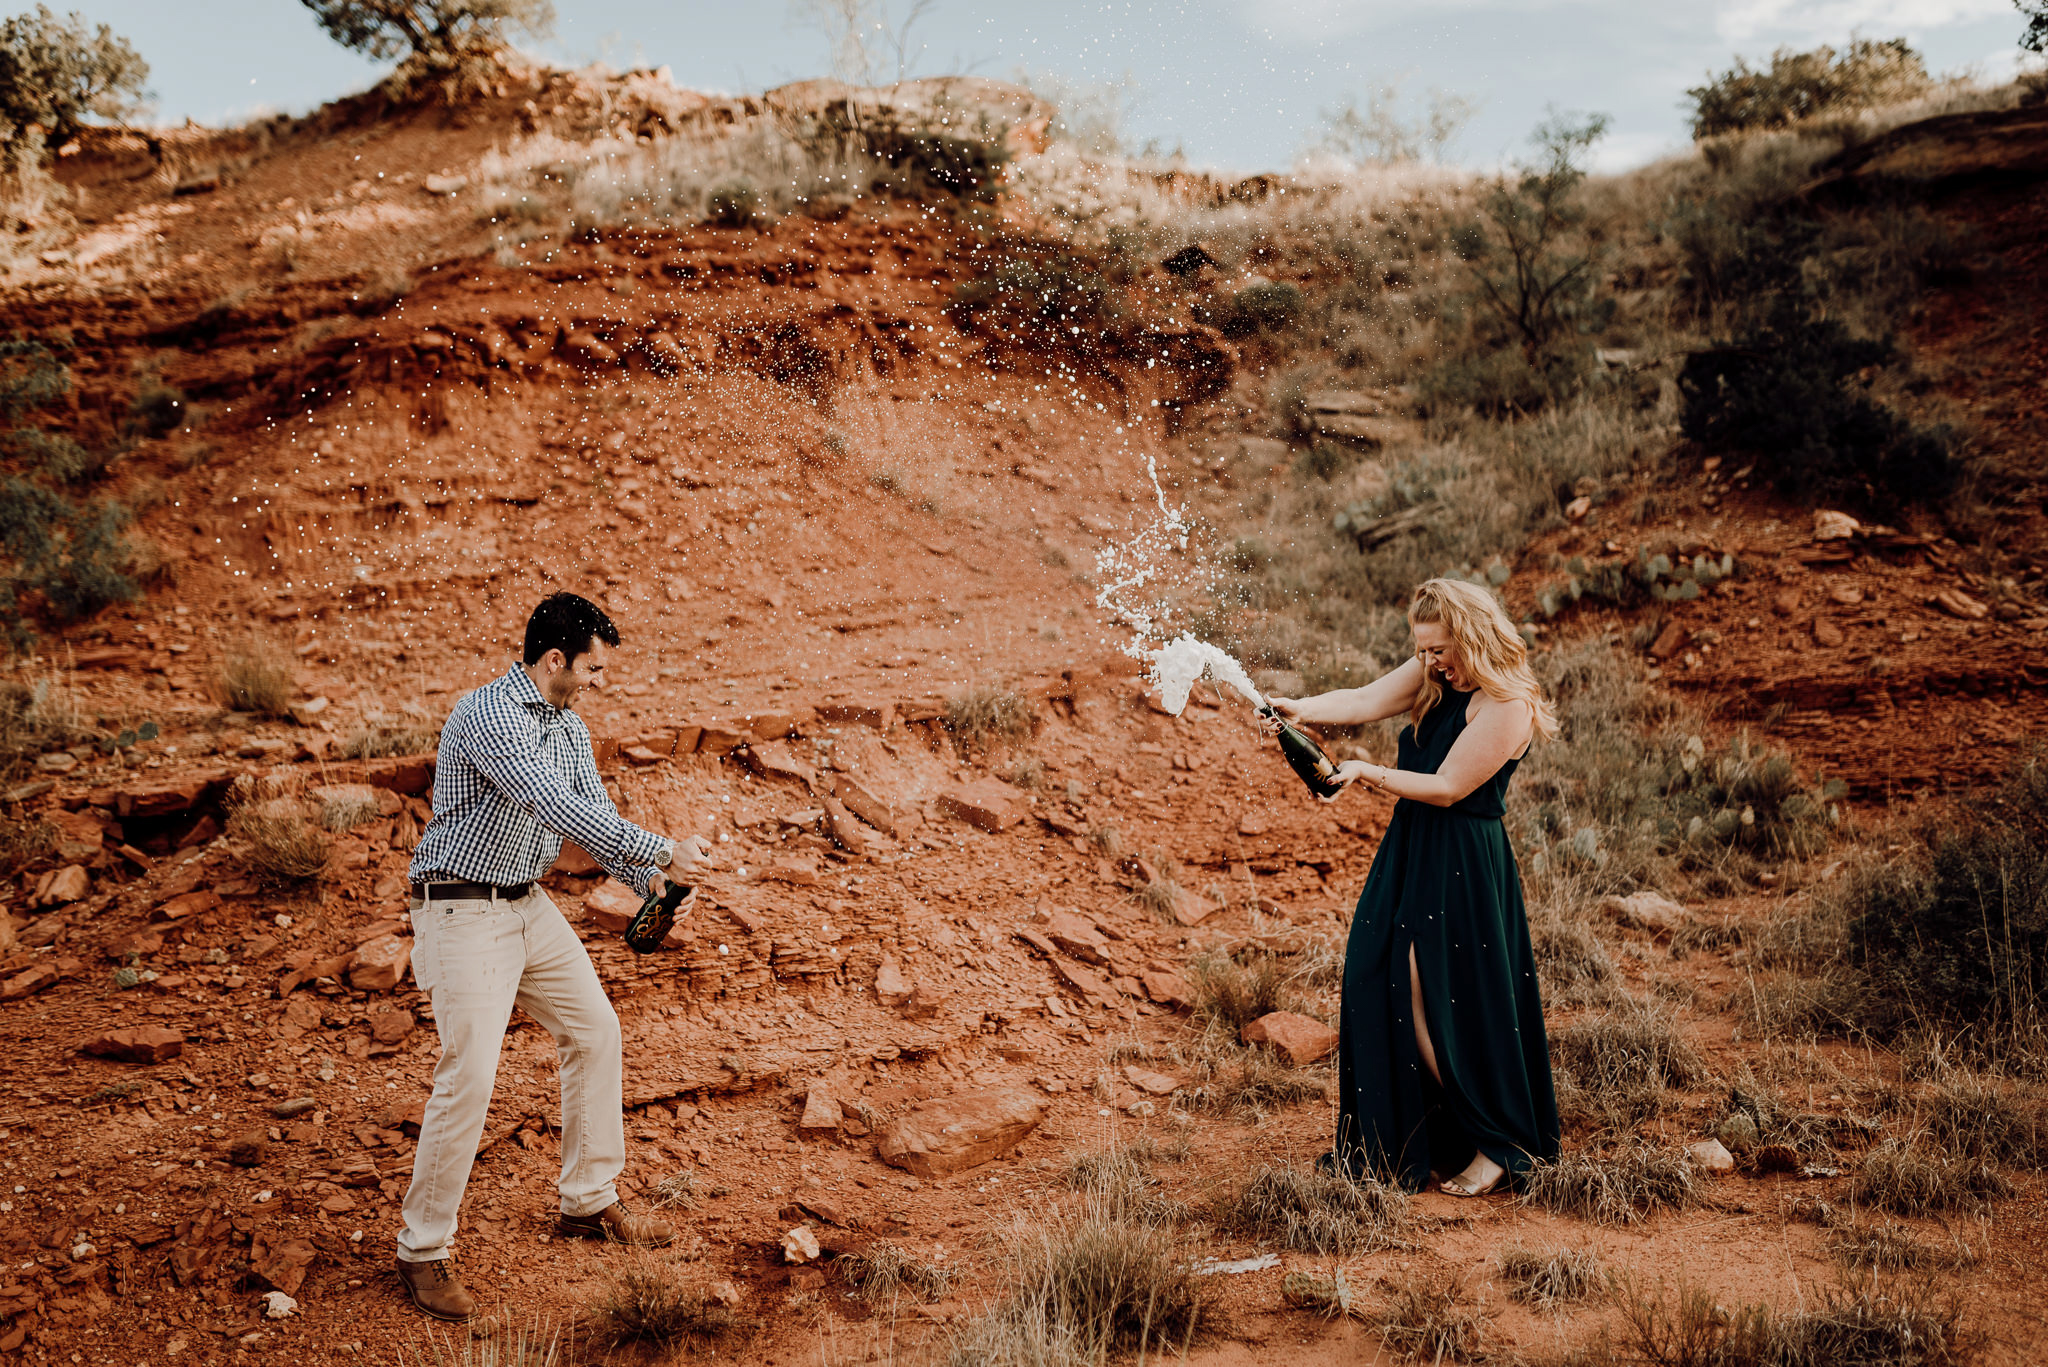 Houston Wedding Photographer-Palo Duro Canyon Engagement Session- Houston Wedding Photographer -Kristen Giles Photography-26.jpg